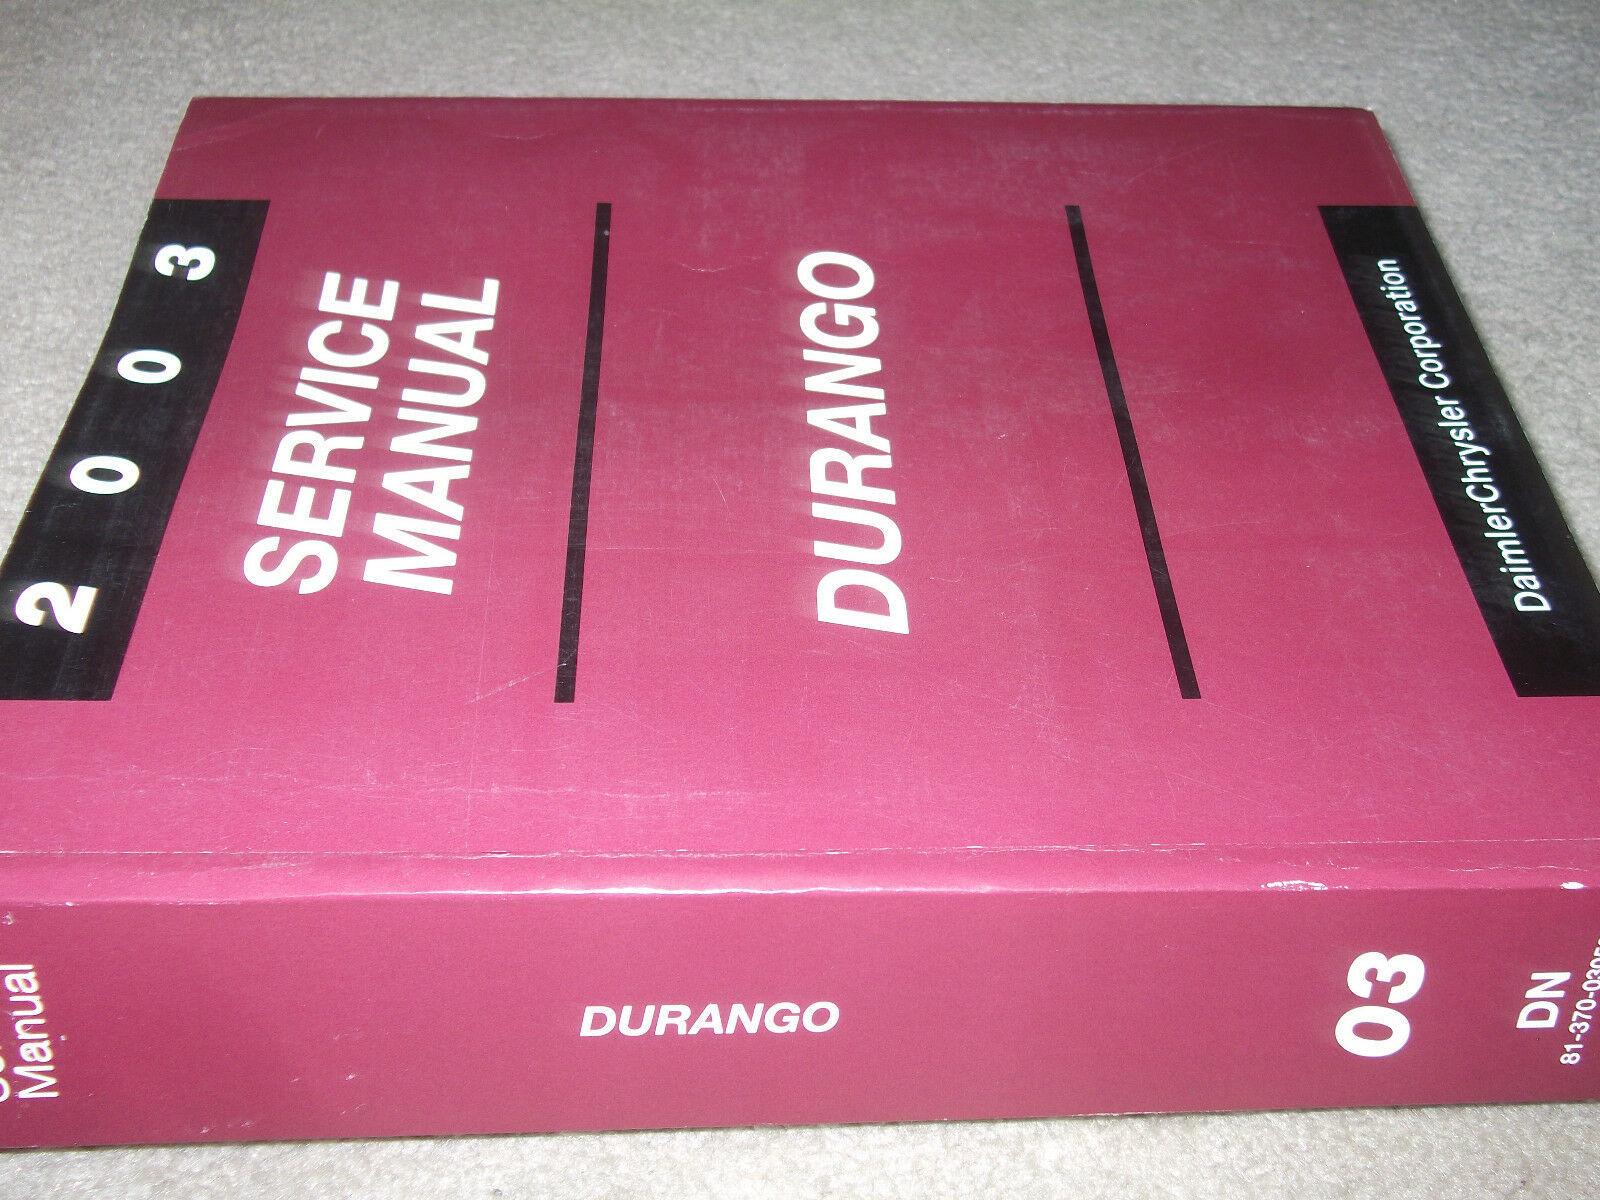 2003 Dodge Durango Service Reparatur Shop Werkstatt Manual OEM Fabrik Buch Mopar